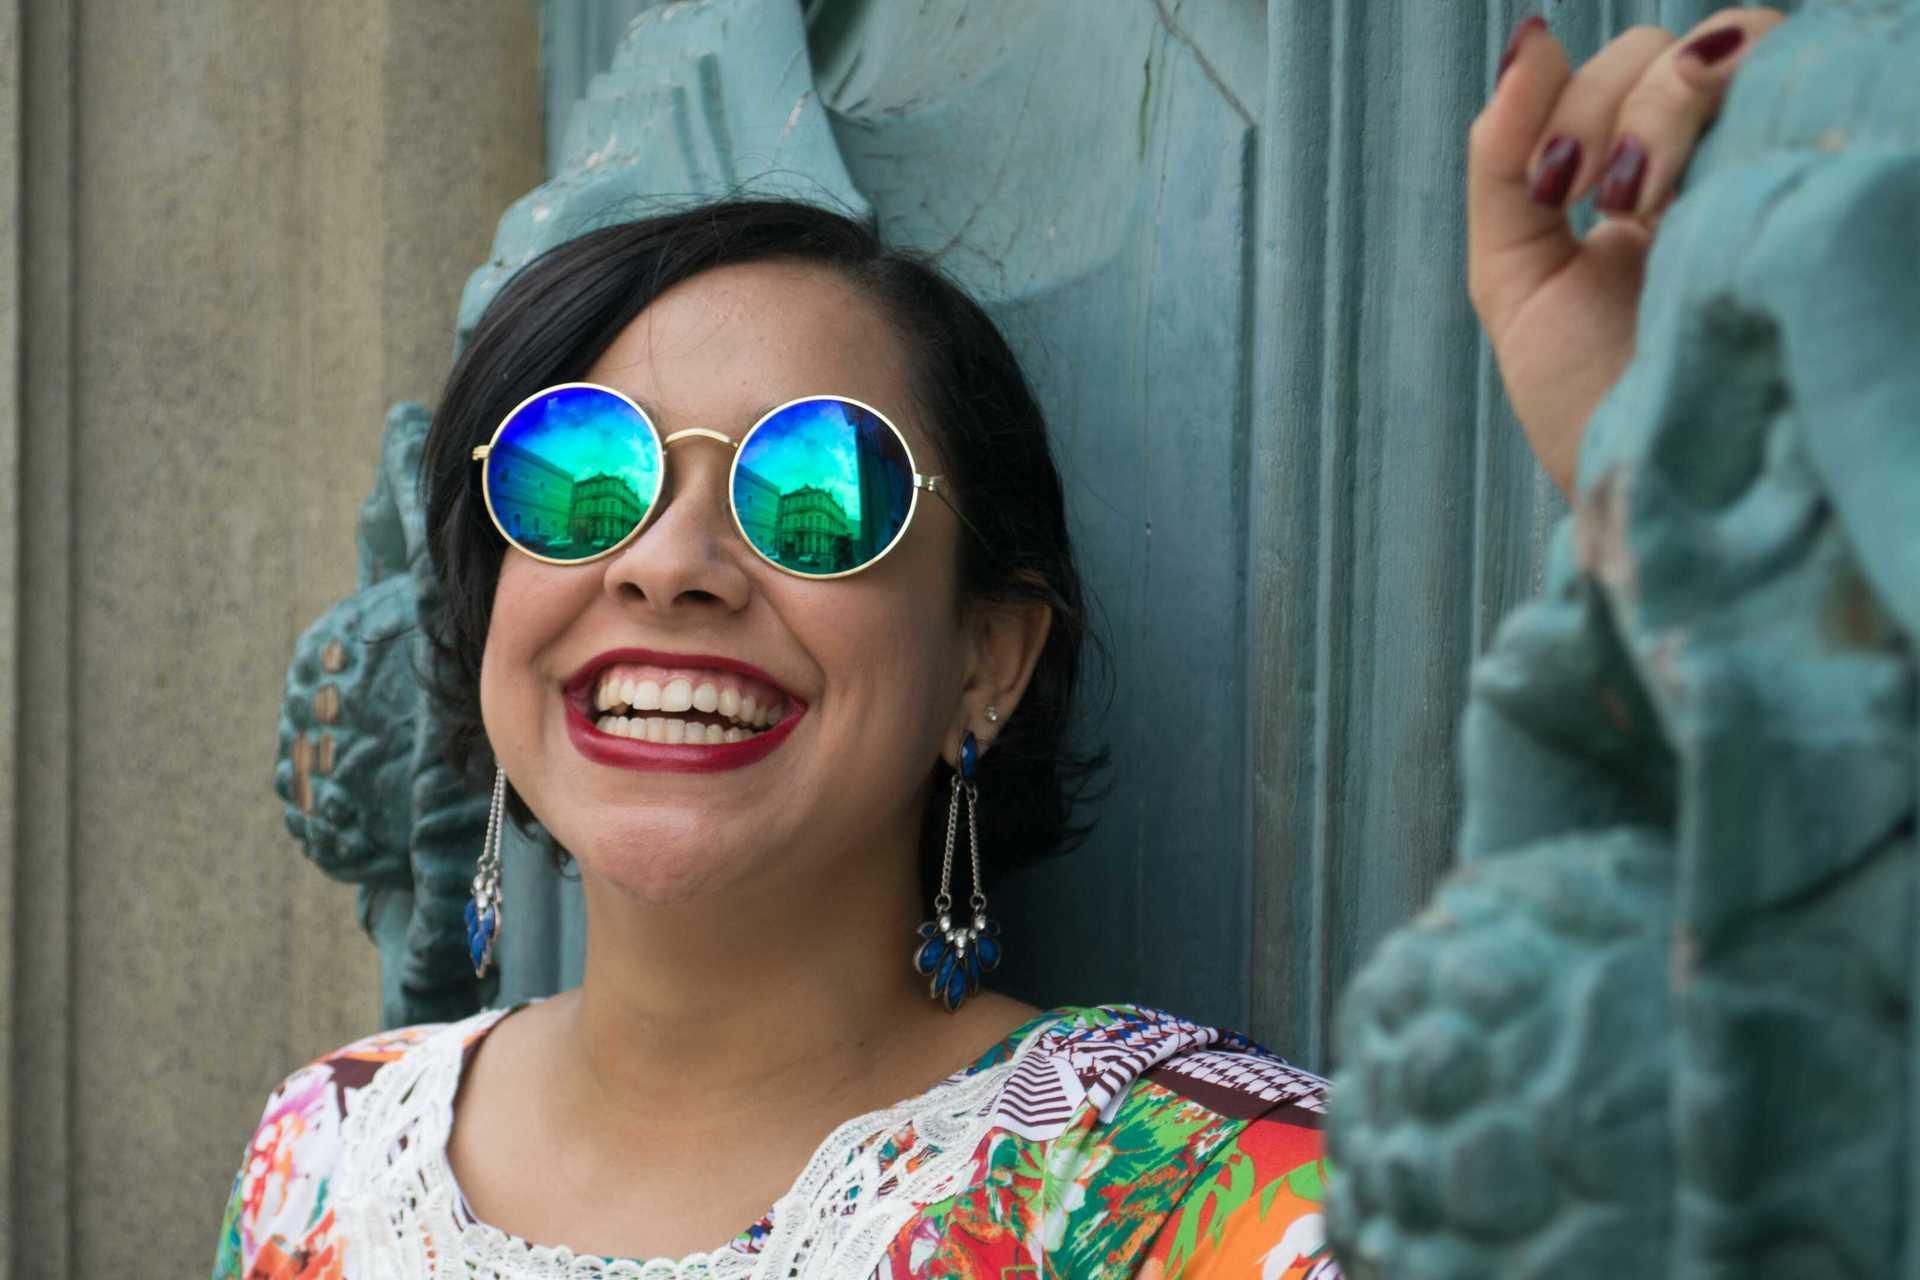 Smiling woman wearing sunglasses | happy, smiling, beautiful, fashion